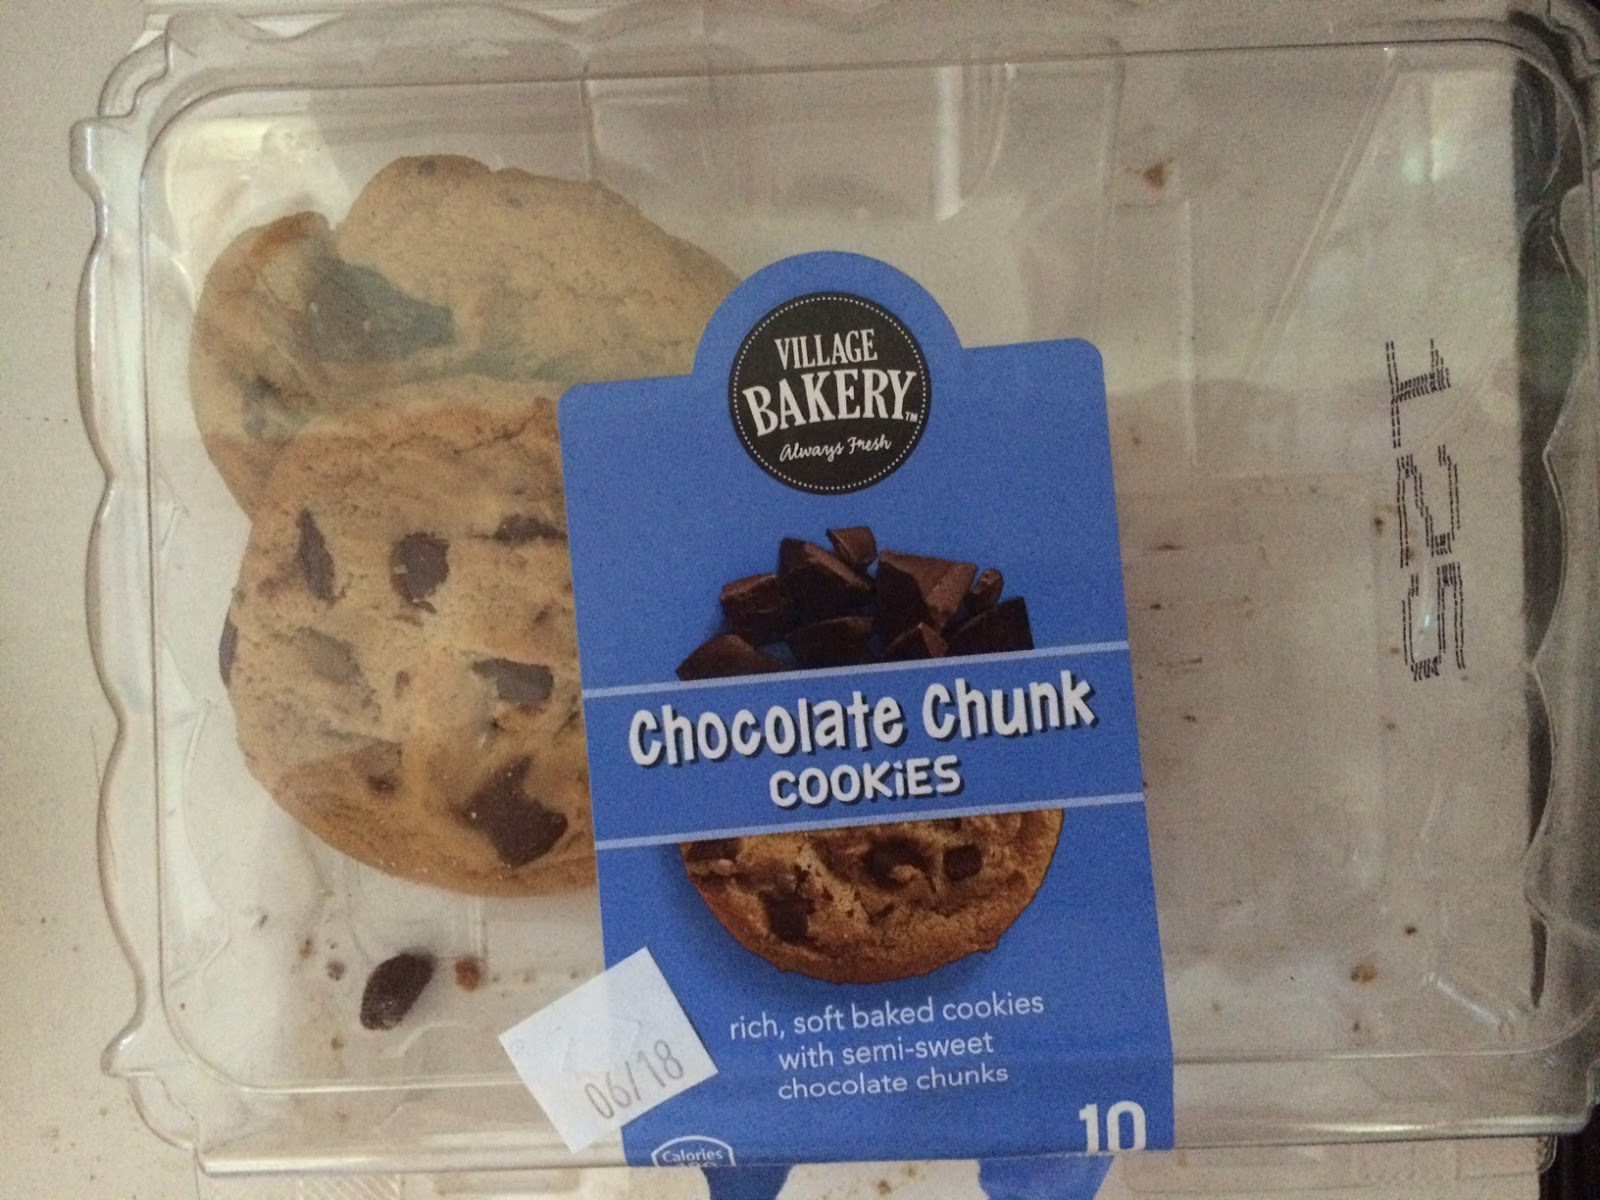 village bakery chocolate chunk and kitchen sink cookies Village Bakery Chocolate Chunk and Kitchen Sink Cookies Aldi